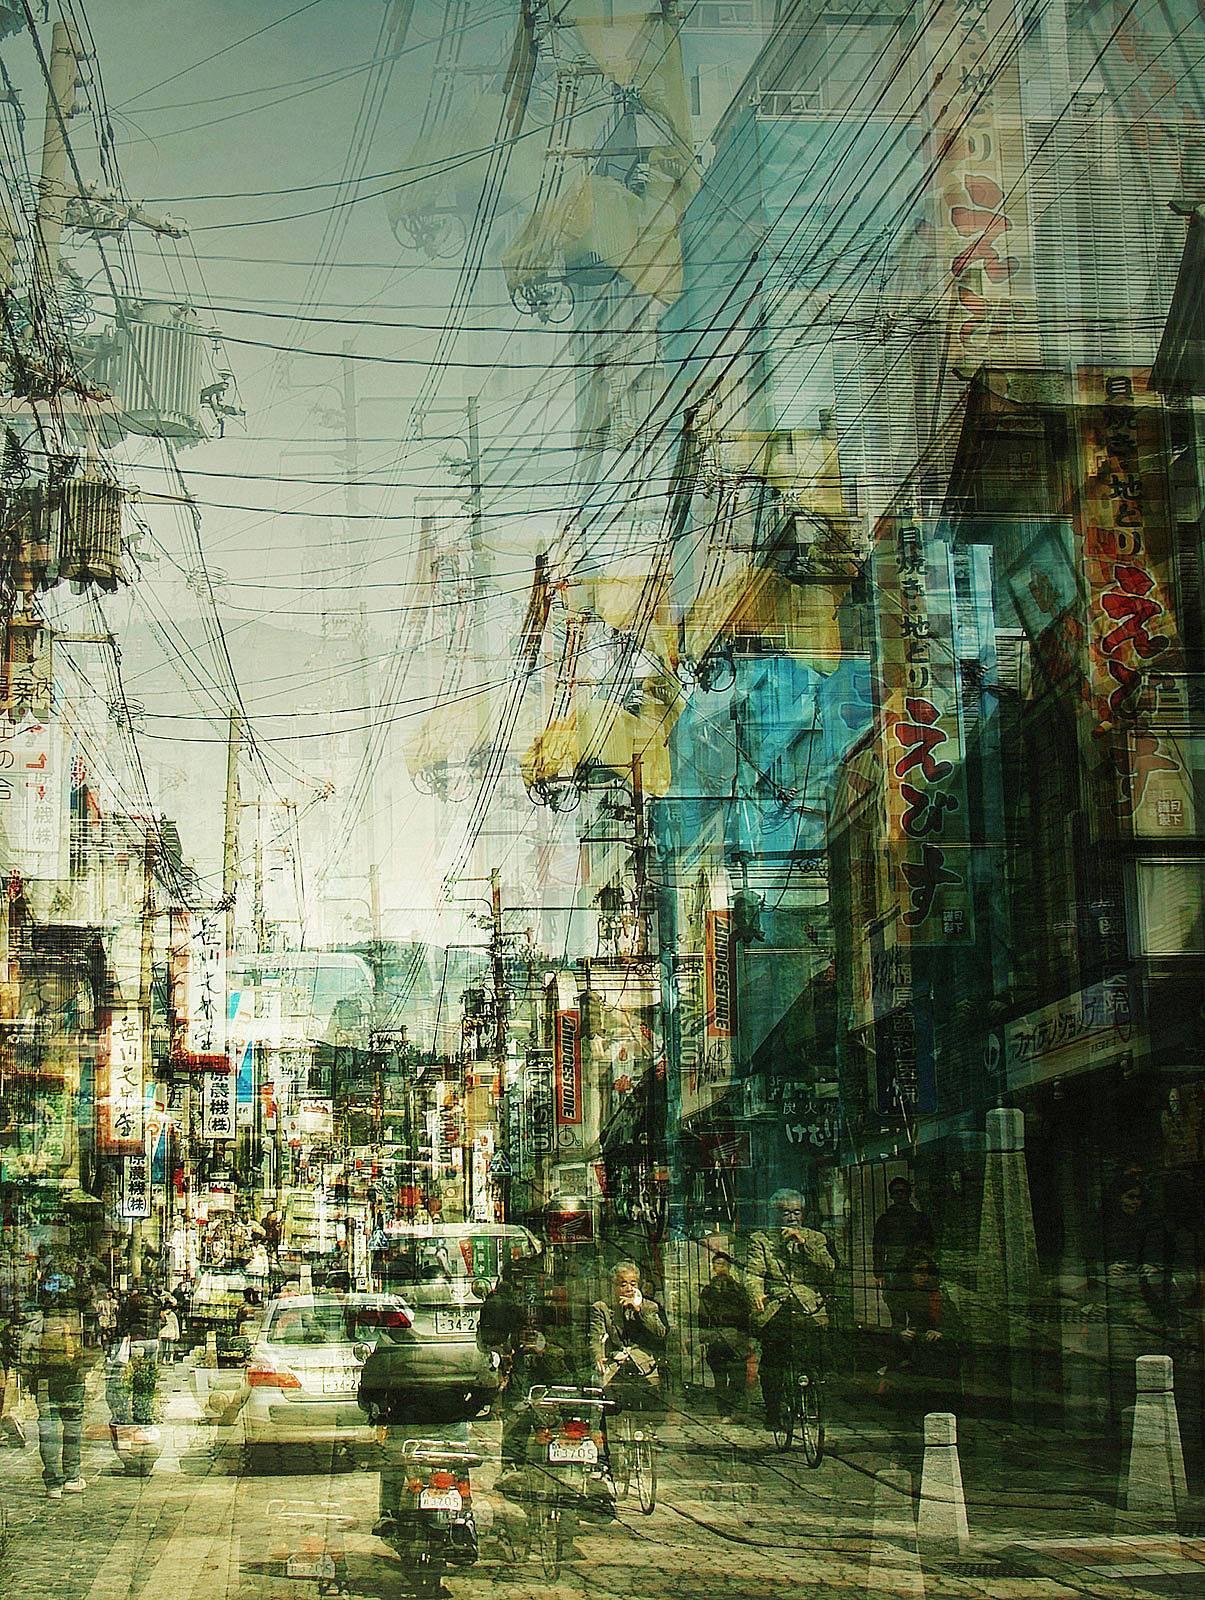 stephanie_jung_sju03_7734_1600_1600_0_0.jpg (JPEG Image, 1205×1600 pixels)